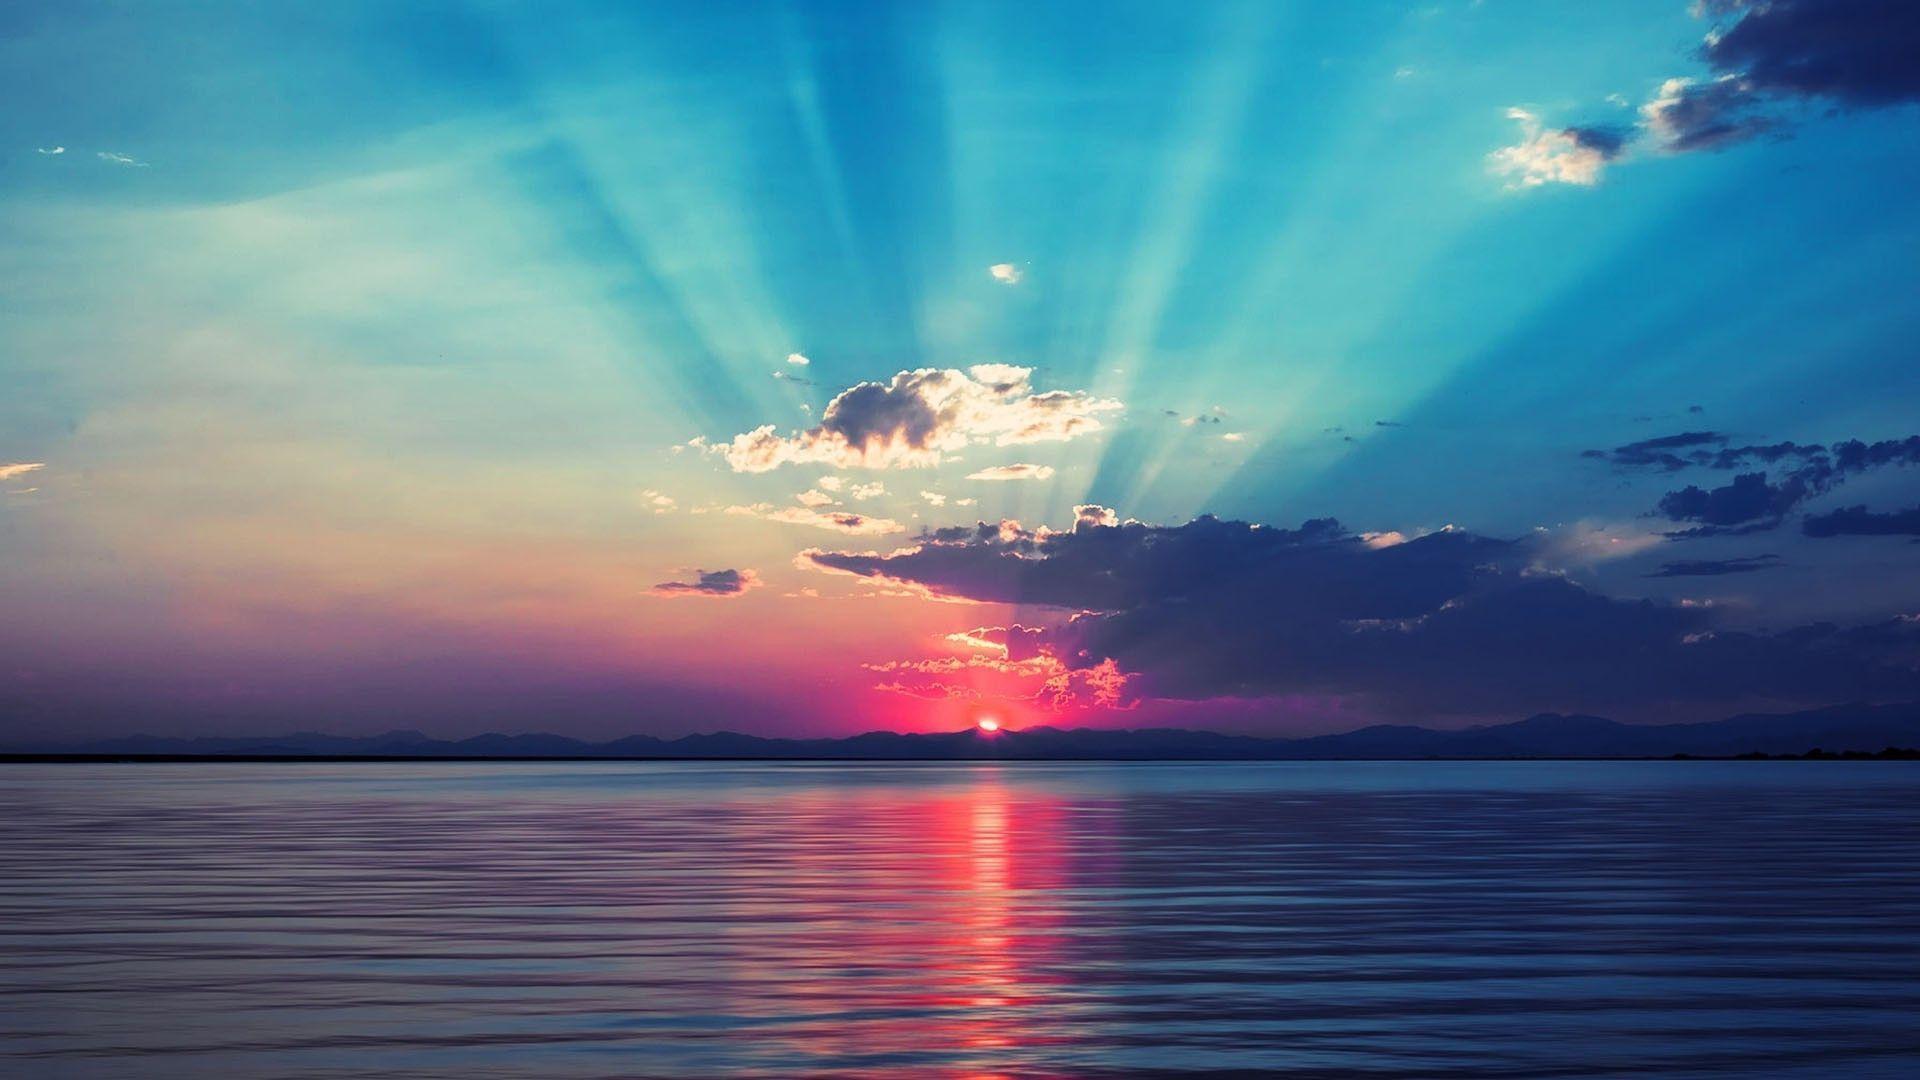 Sunrise Sky Wallpaper Hd Widescreen 11 HD Wallpapers | Eakai.